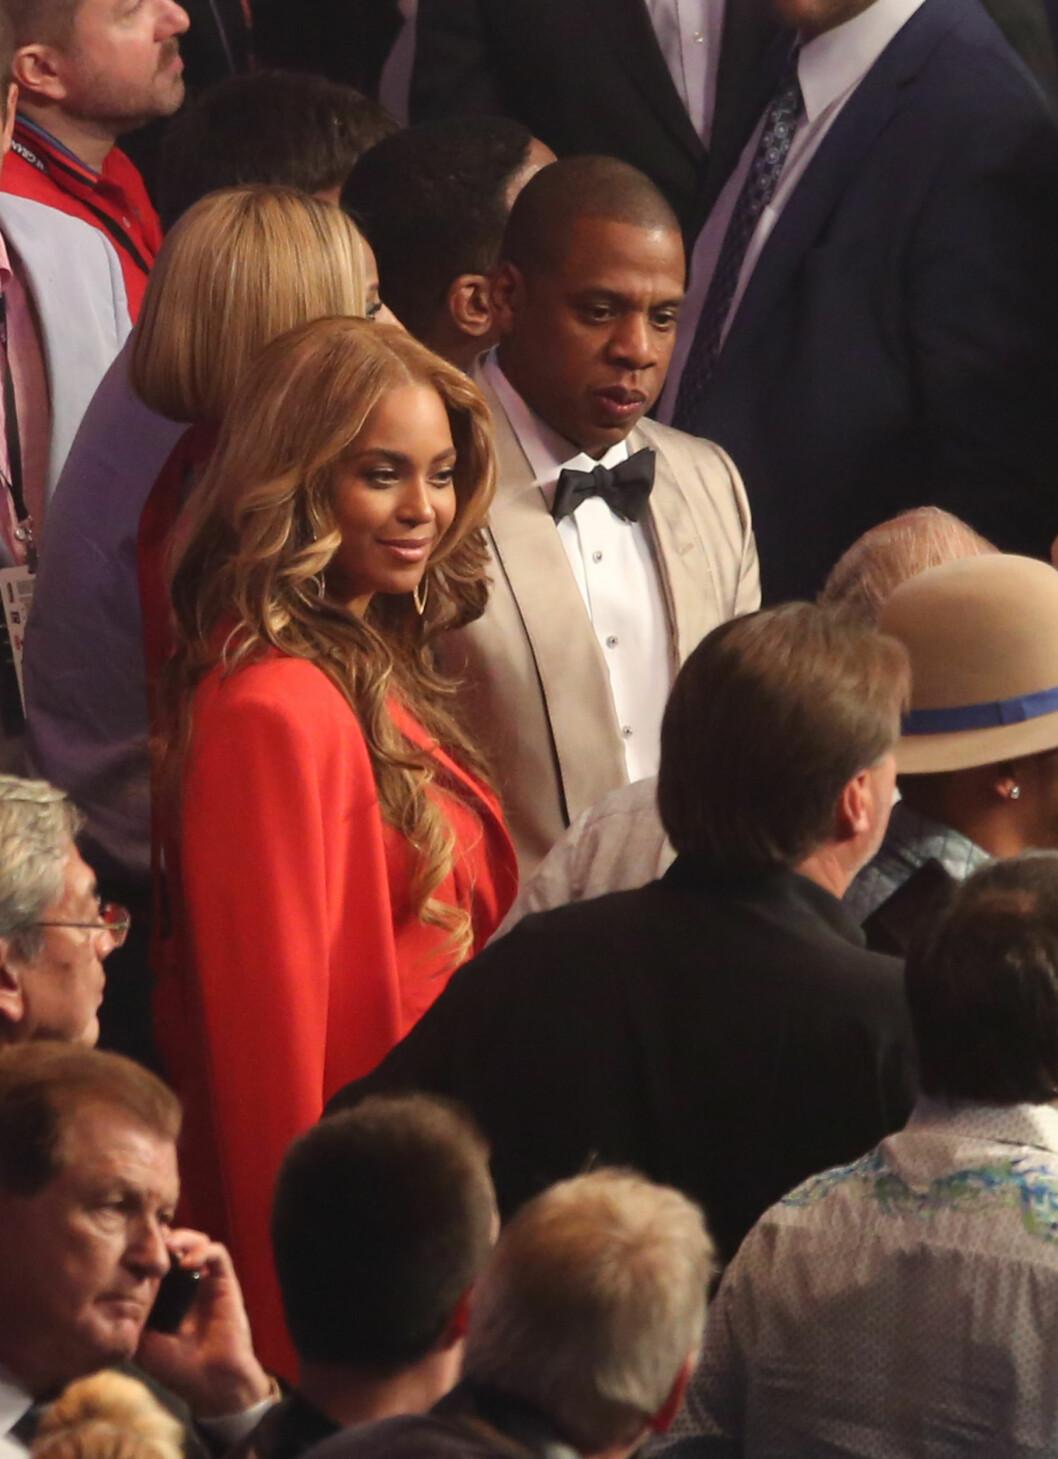 SUPERSTJERNER: Beyoncé og Jay Z krevde stive priser på den eksklusive festen de arrangerte etter boksekampen.  Foto: Zuma Press